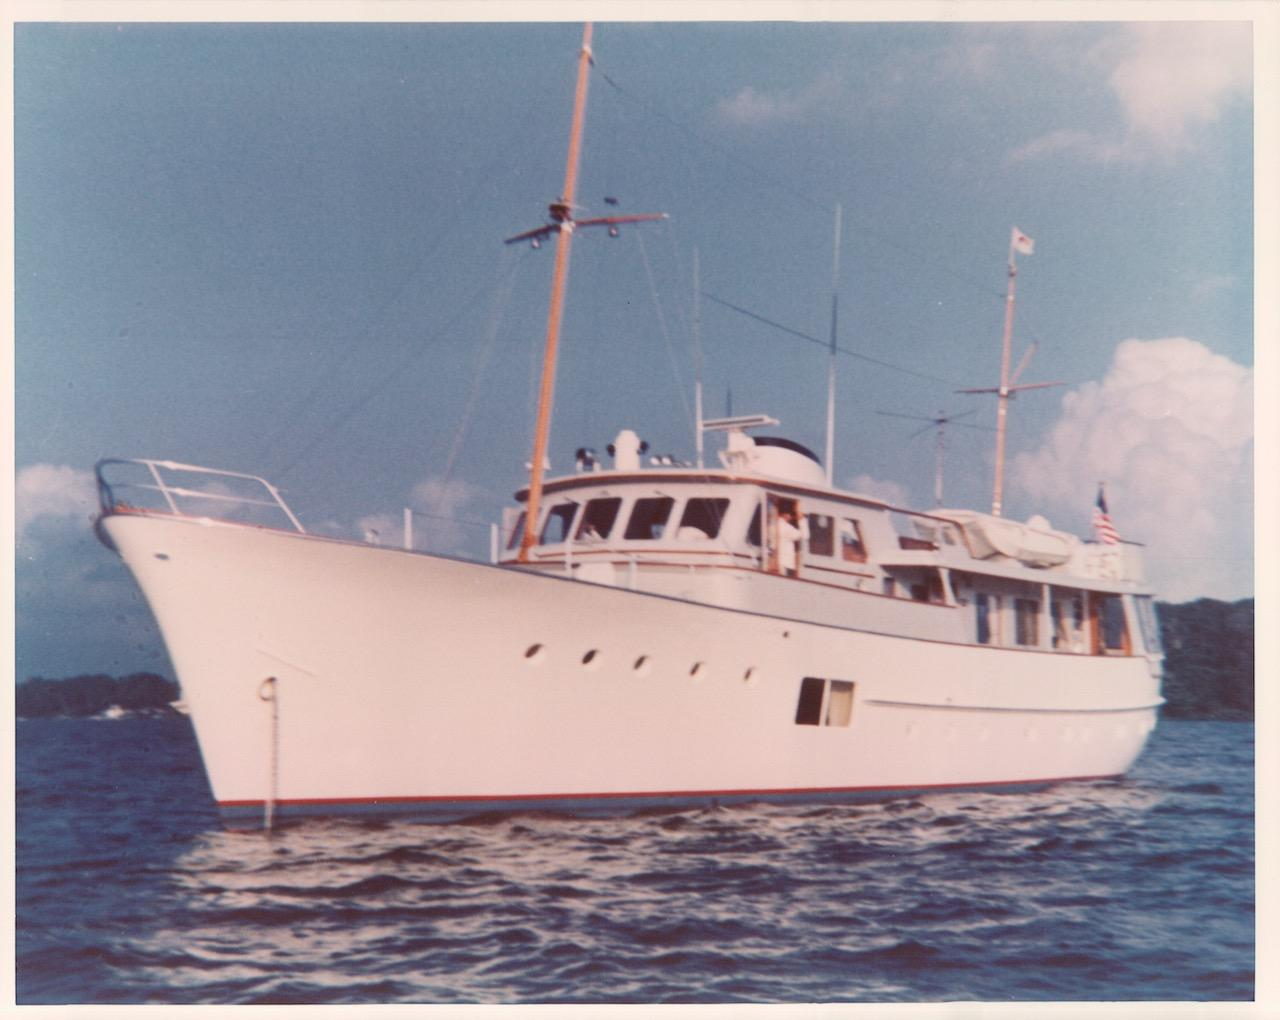 86 Feadship City (ex: Exact, Anoatok) 1964 Freeport | Denison Yacht Sales